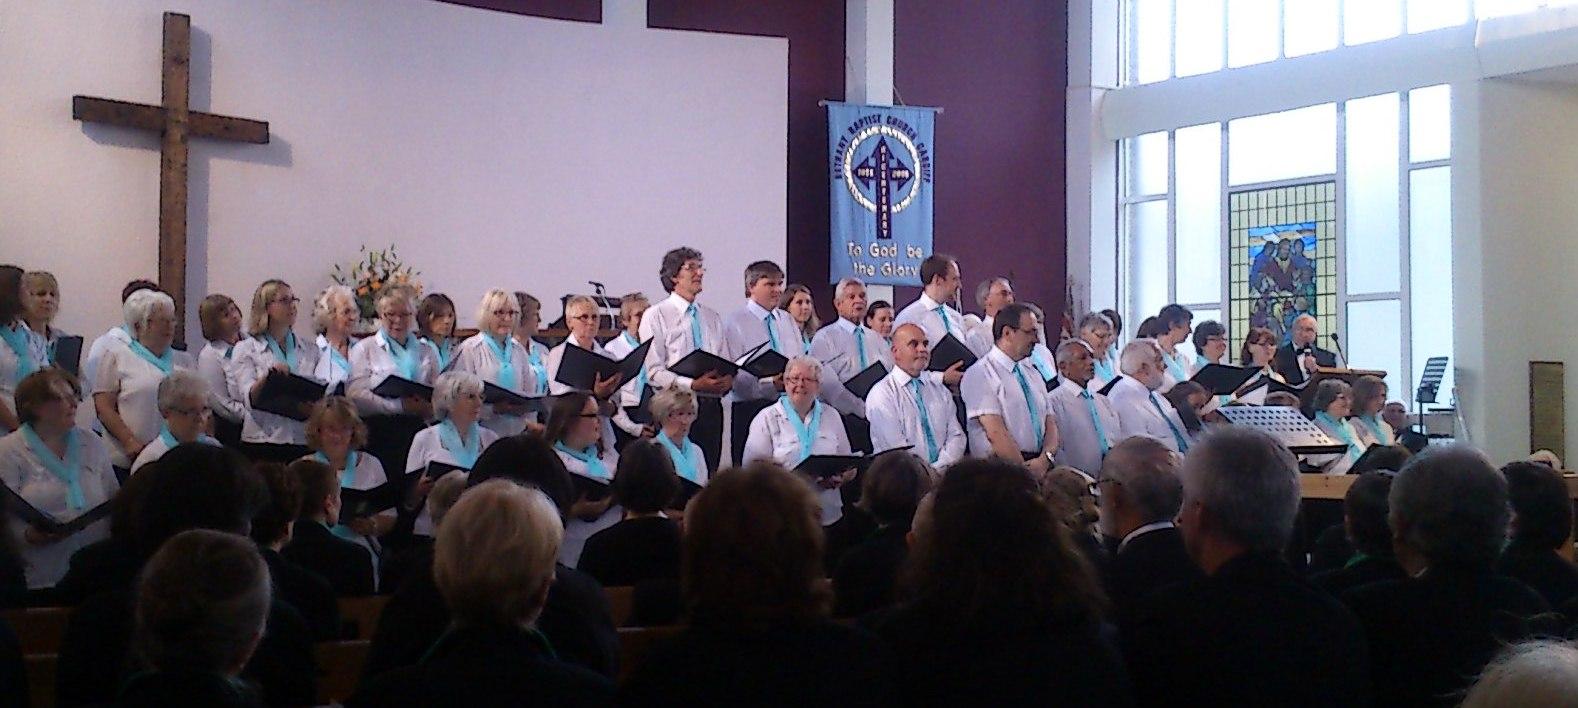 Gabalfa Community Choir cropped